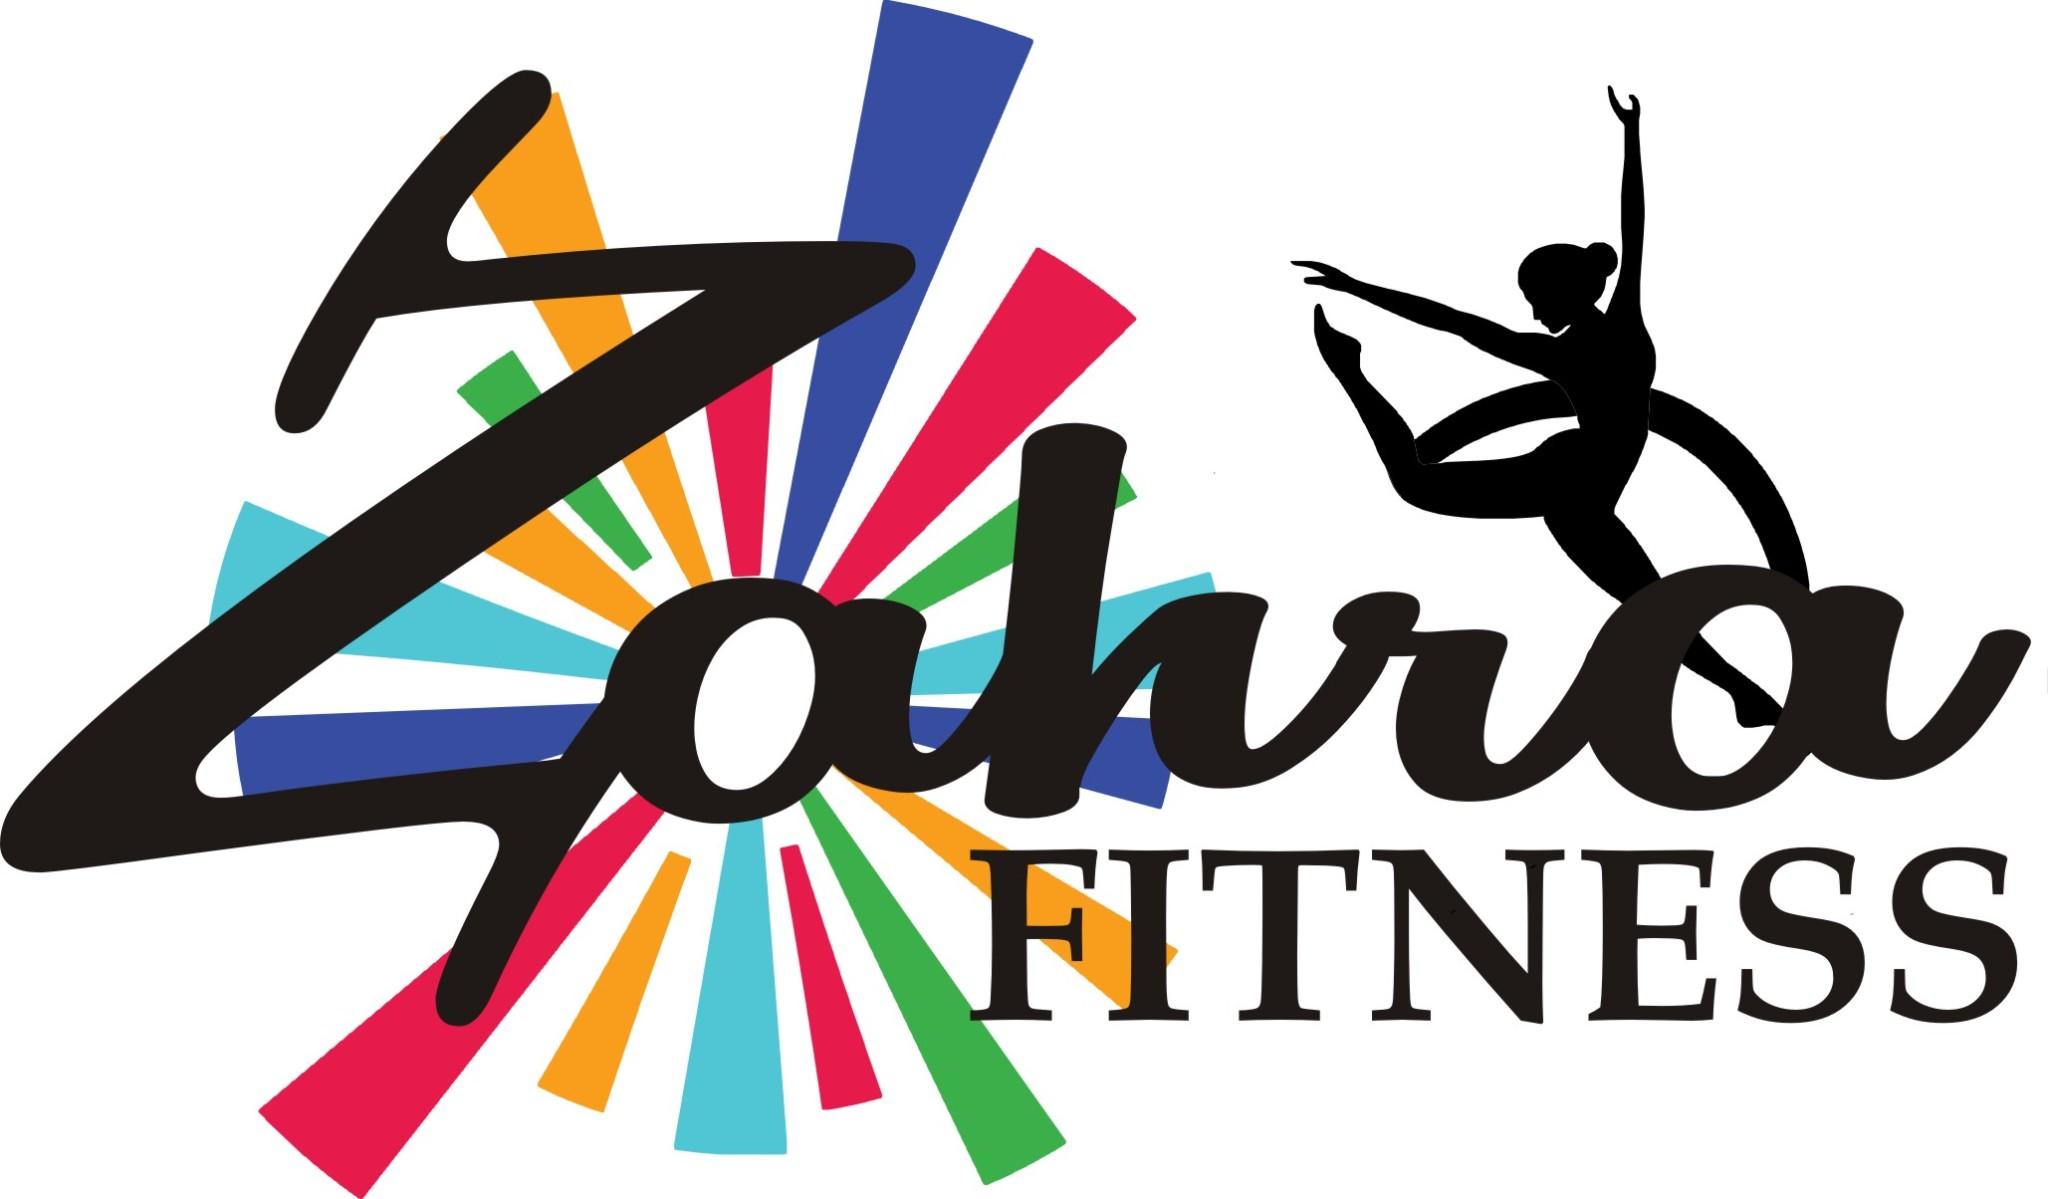 Zahra Fitness